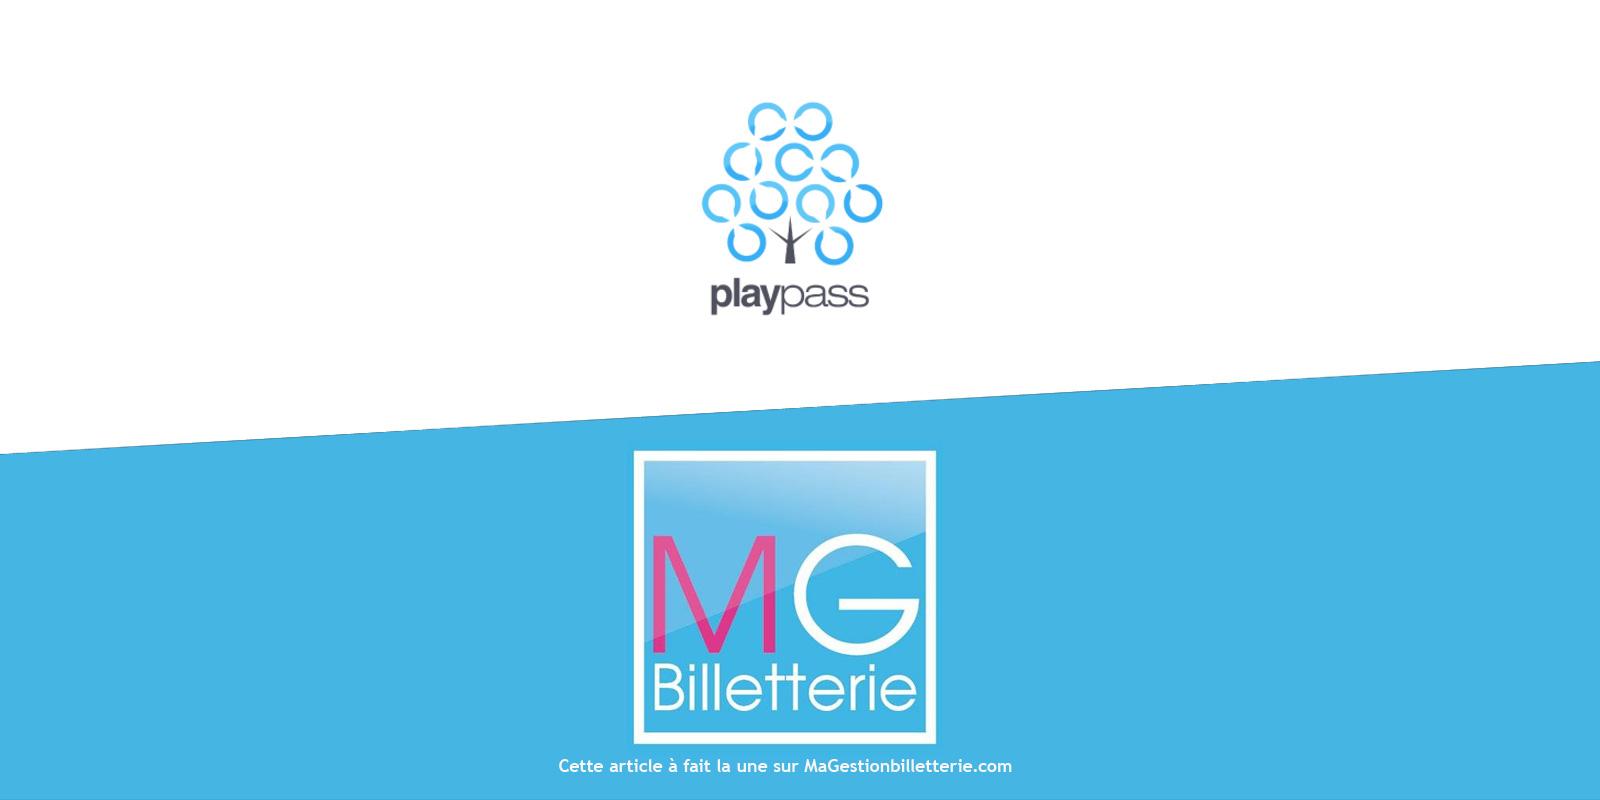 playpass-une3